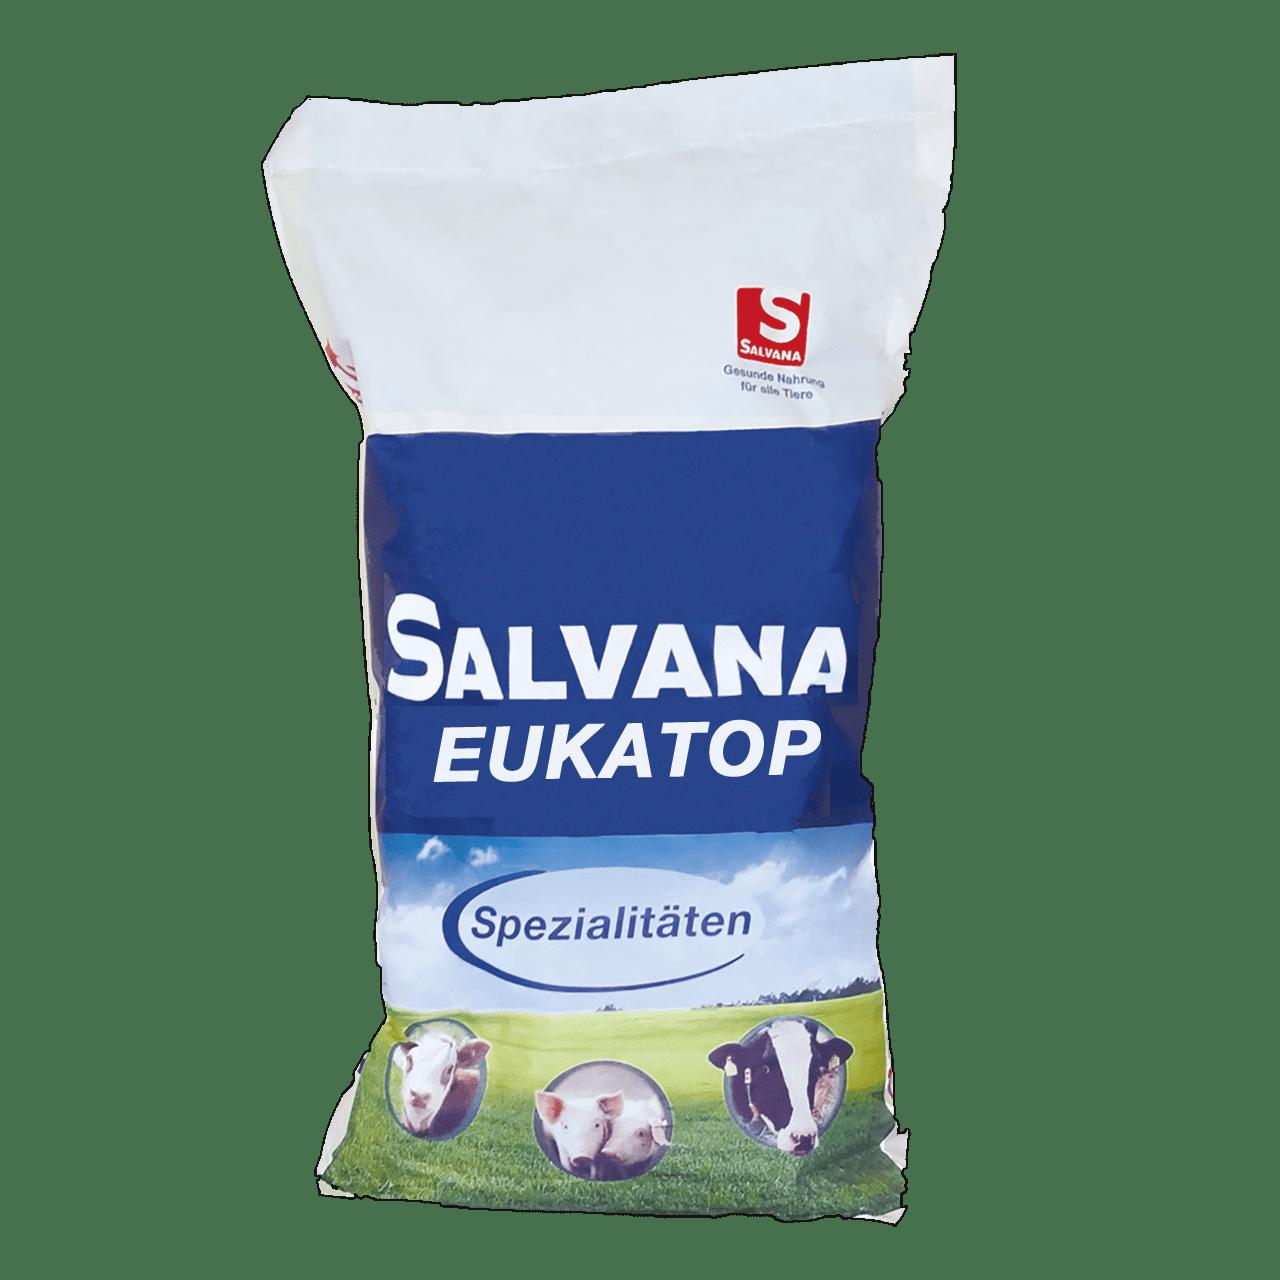 SALVANA EUKATOP